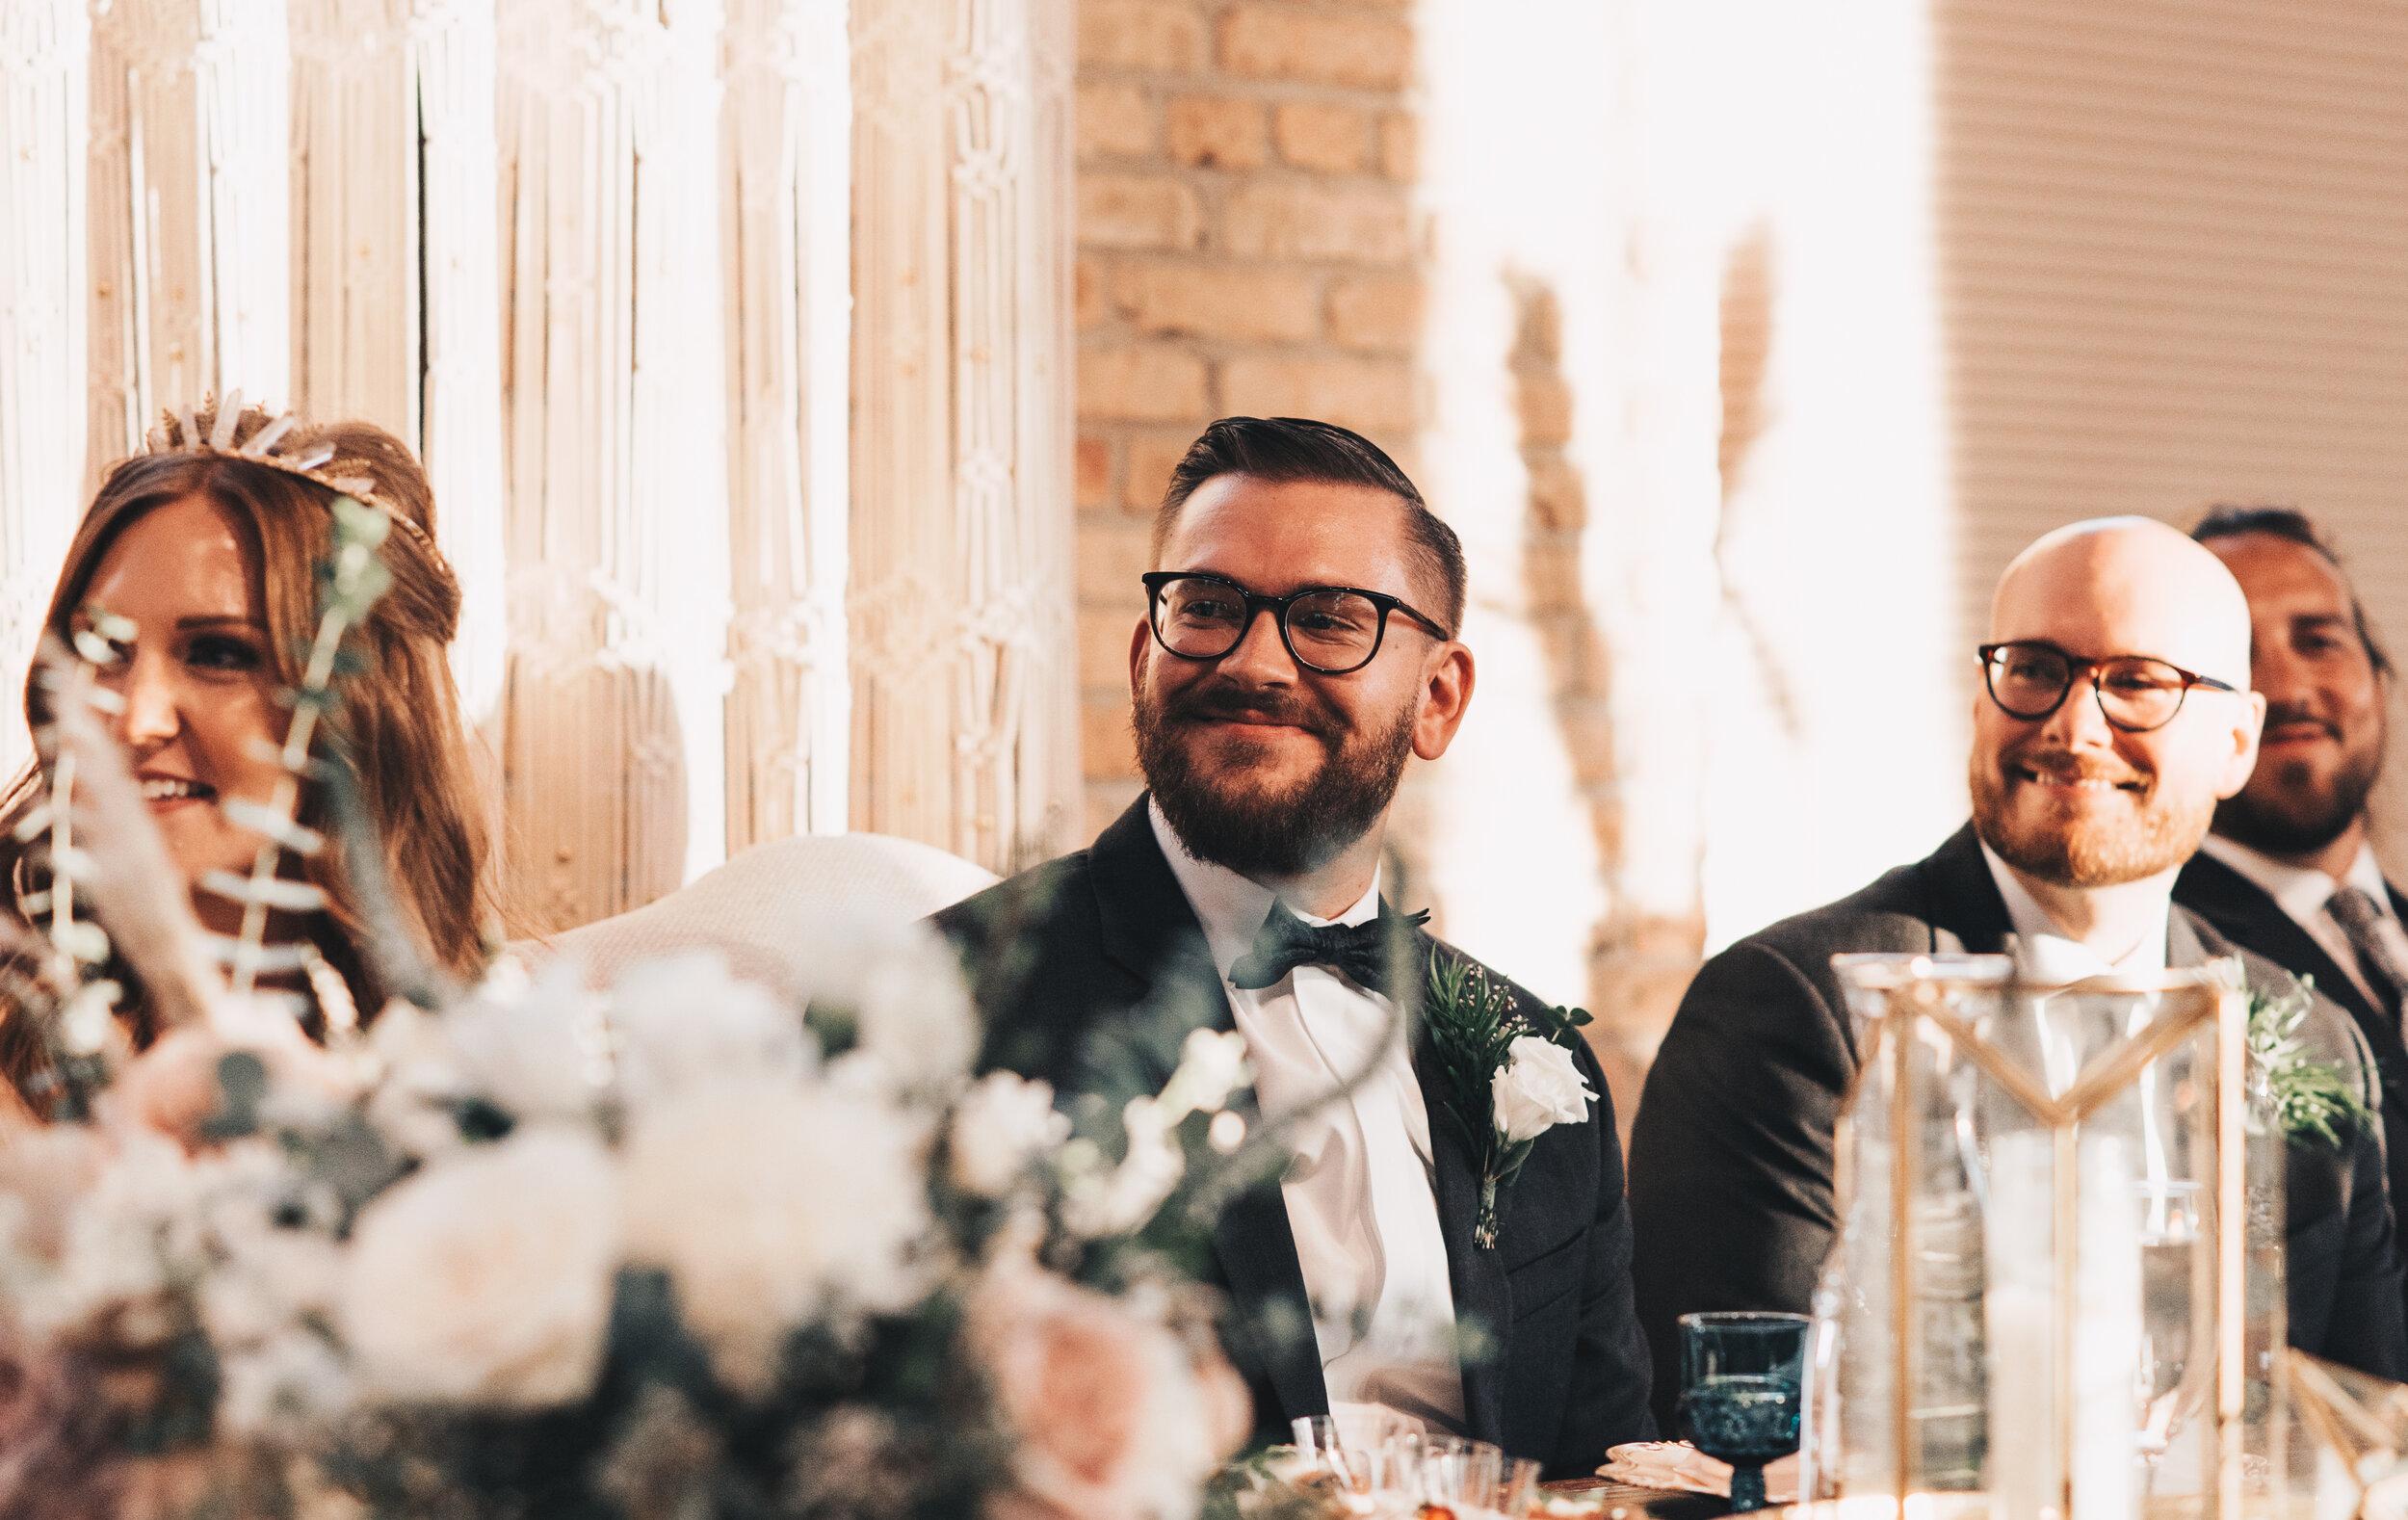 Modern Industrial Wedding, The Brix on the Fox, The BRIX, Chicago Industrial Wedding, Modern Midwest Wedding, The Brix on the Fox Wedding, The BRIX Wedding, Wedding Speeches Photos